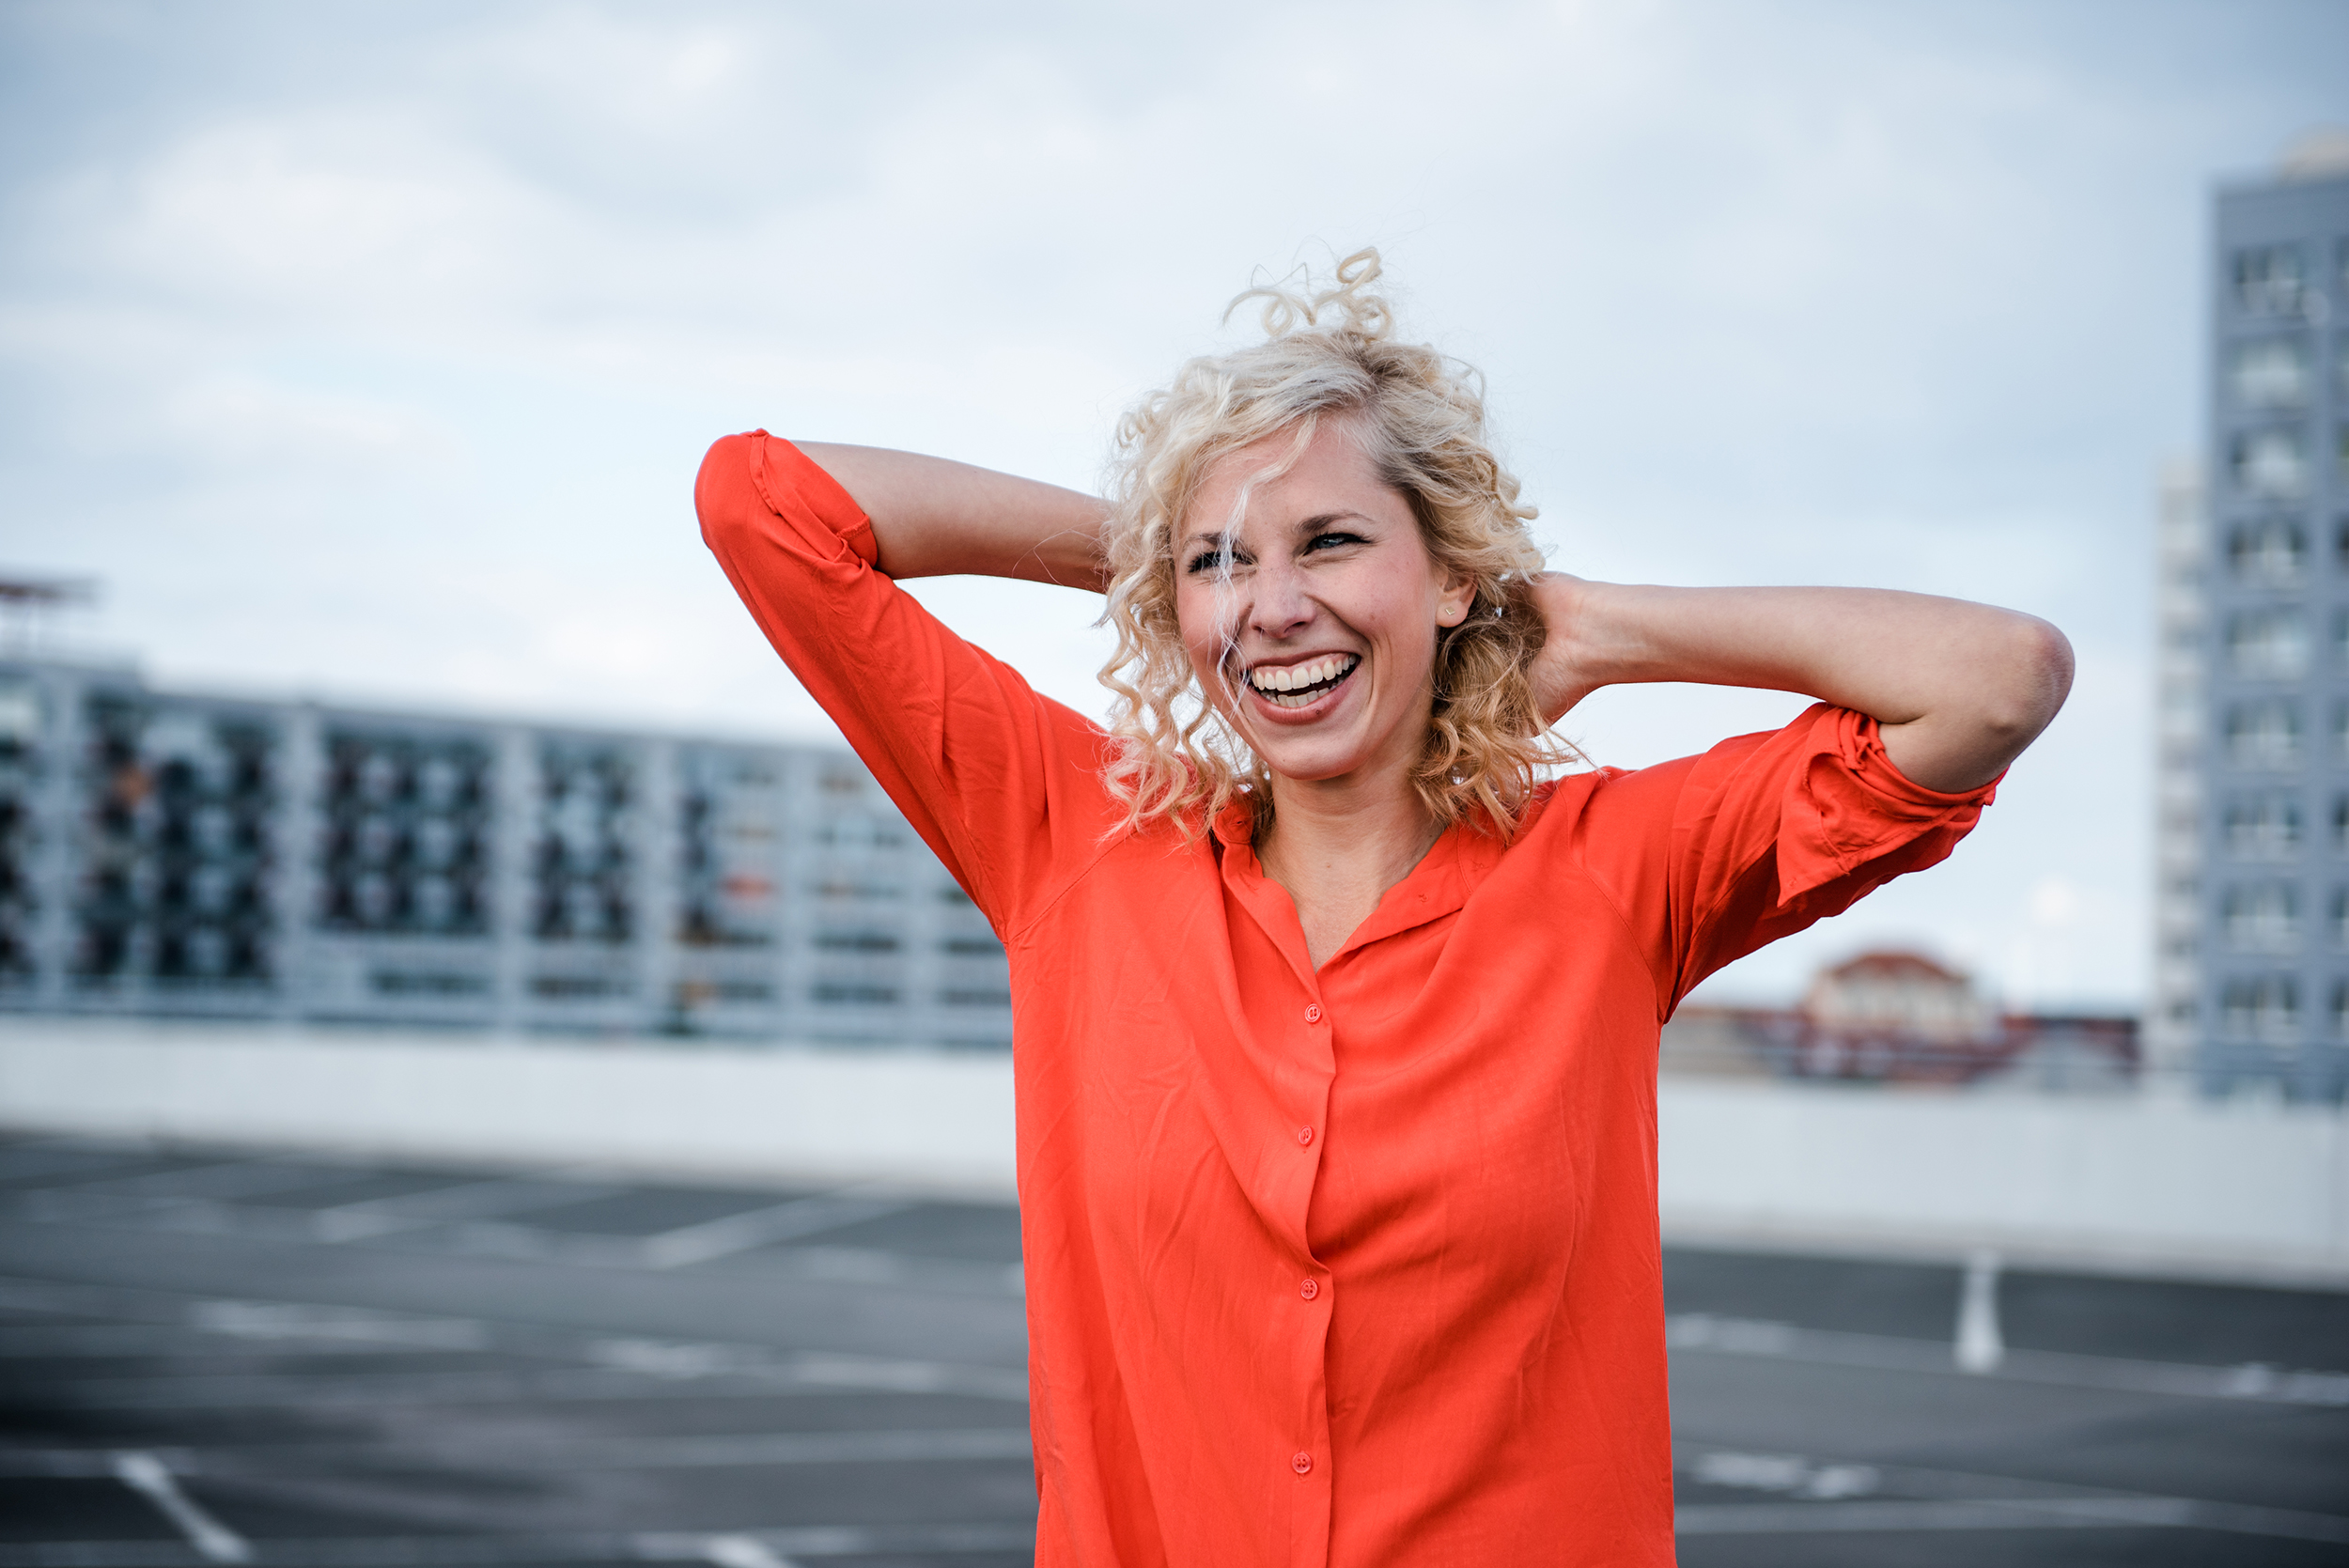 Portraitfoto Frau in roter Bluse lachend